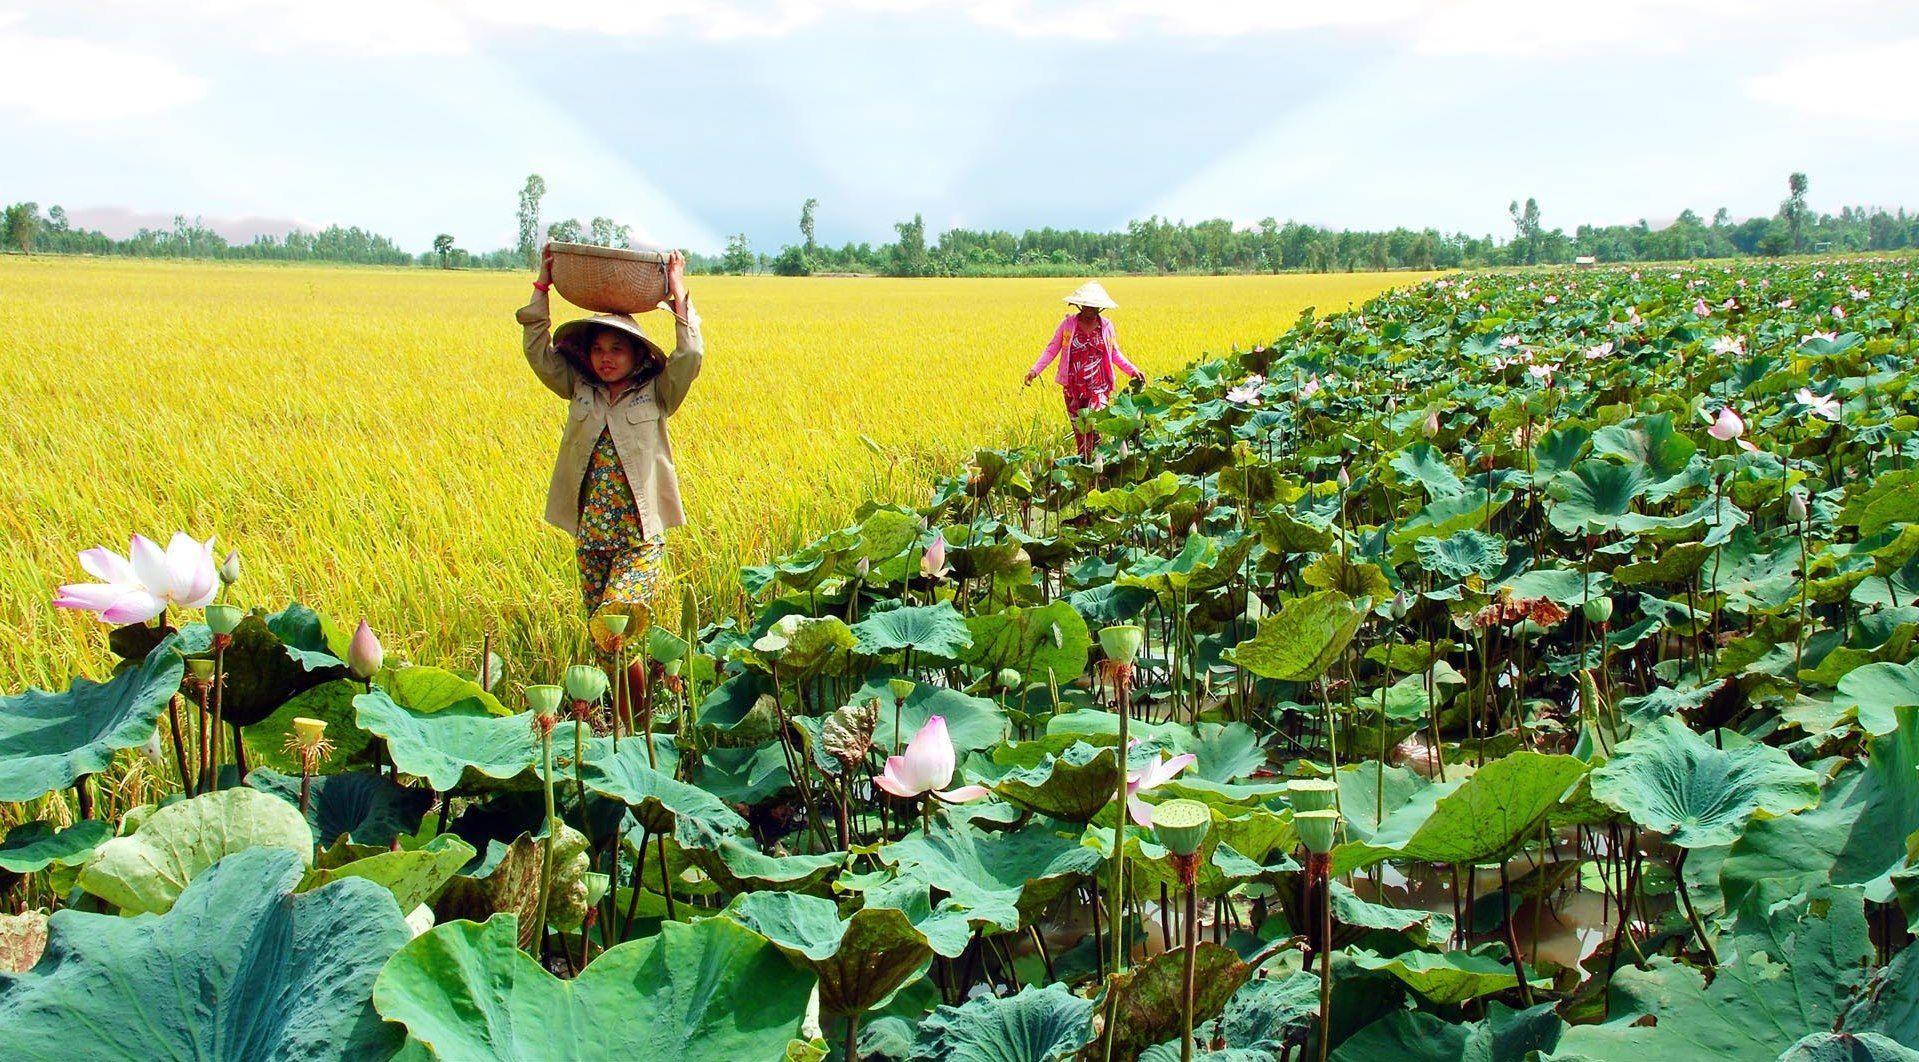 Visita a humedal Dong Thap Muoi en temporada de crecidas